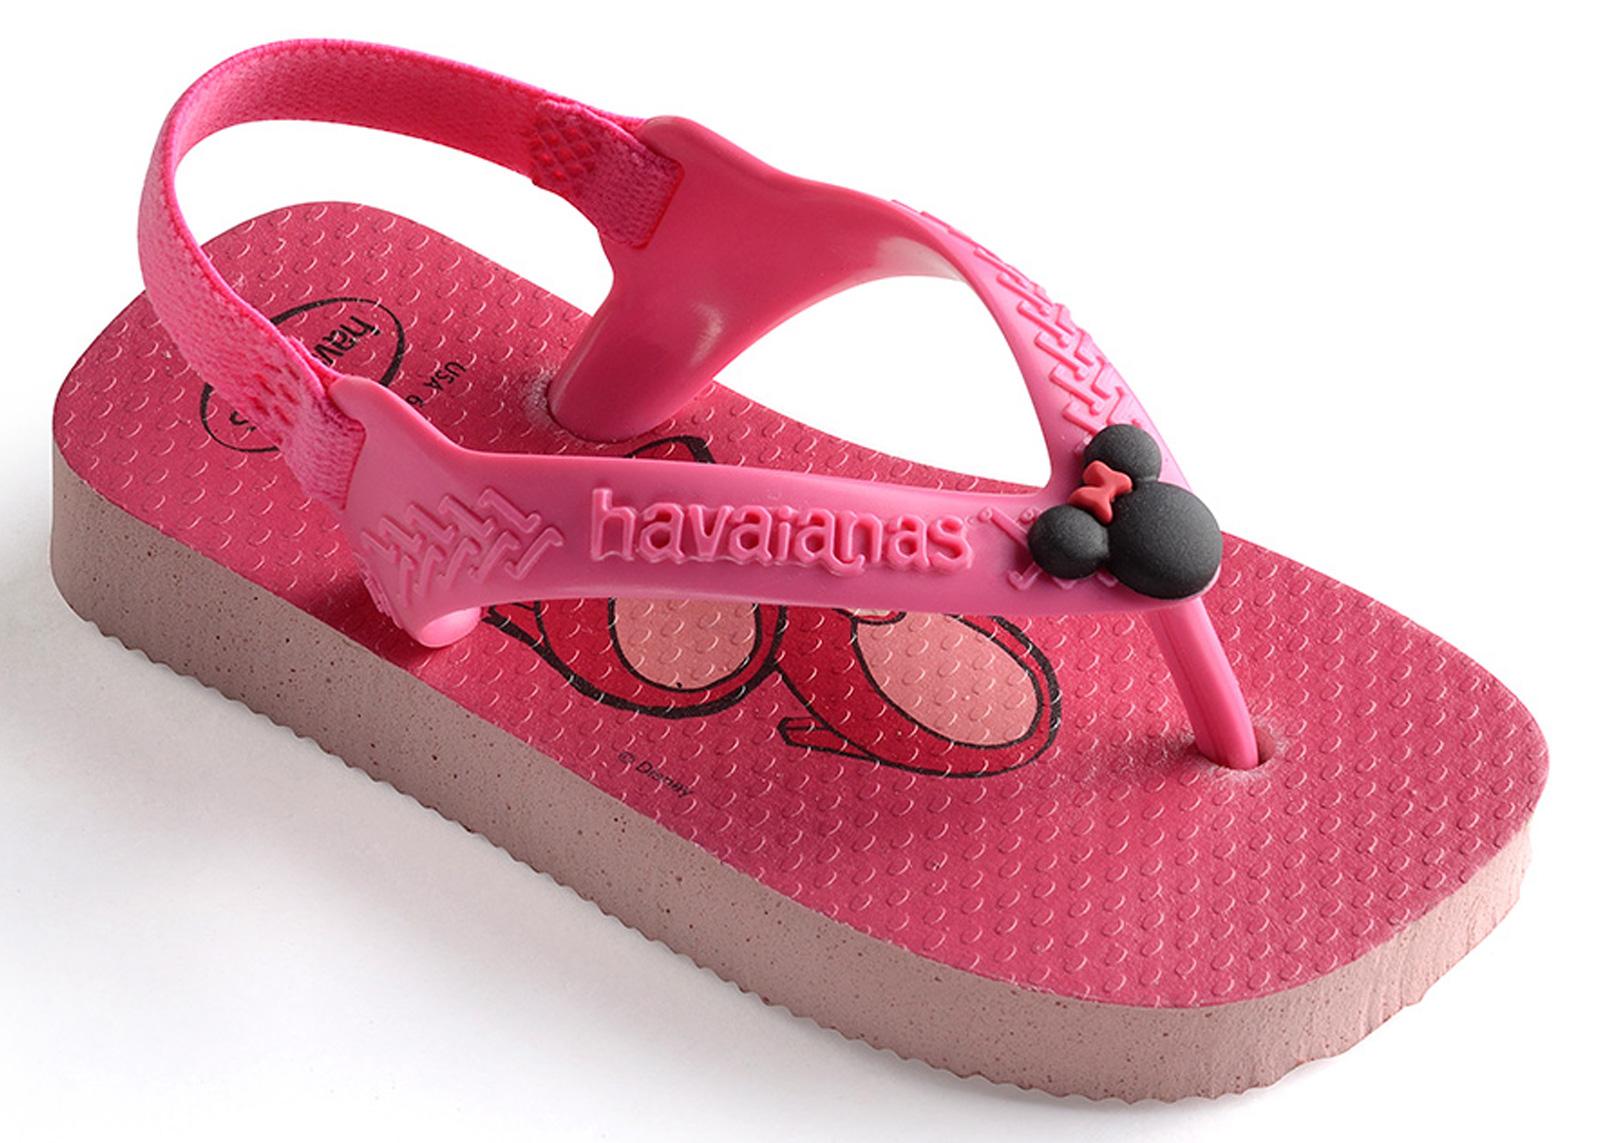 f19bedbea3ea1 Sandals Baby Disney Classics Ii Pearl Pink - Brand Havaianas